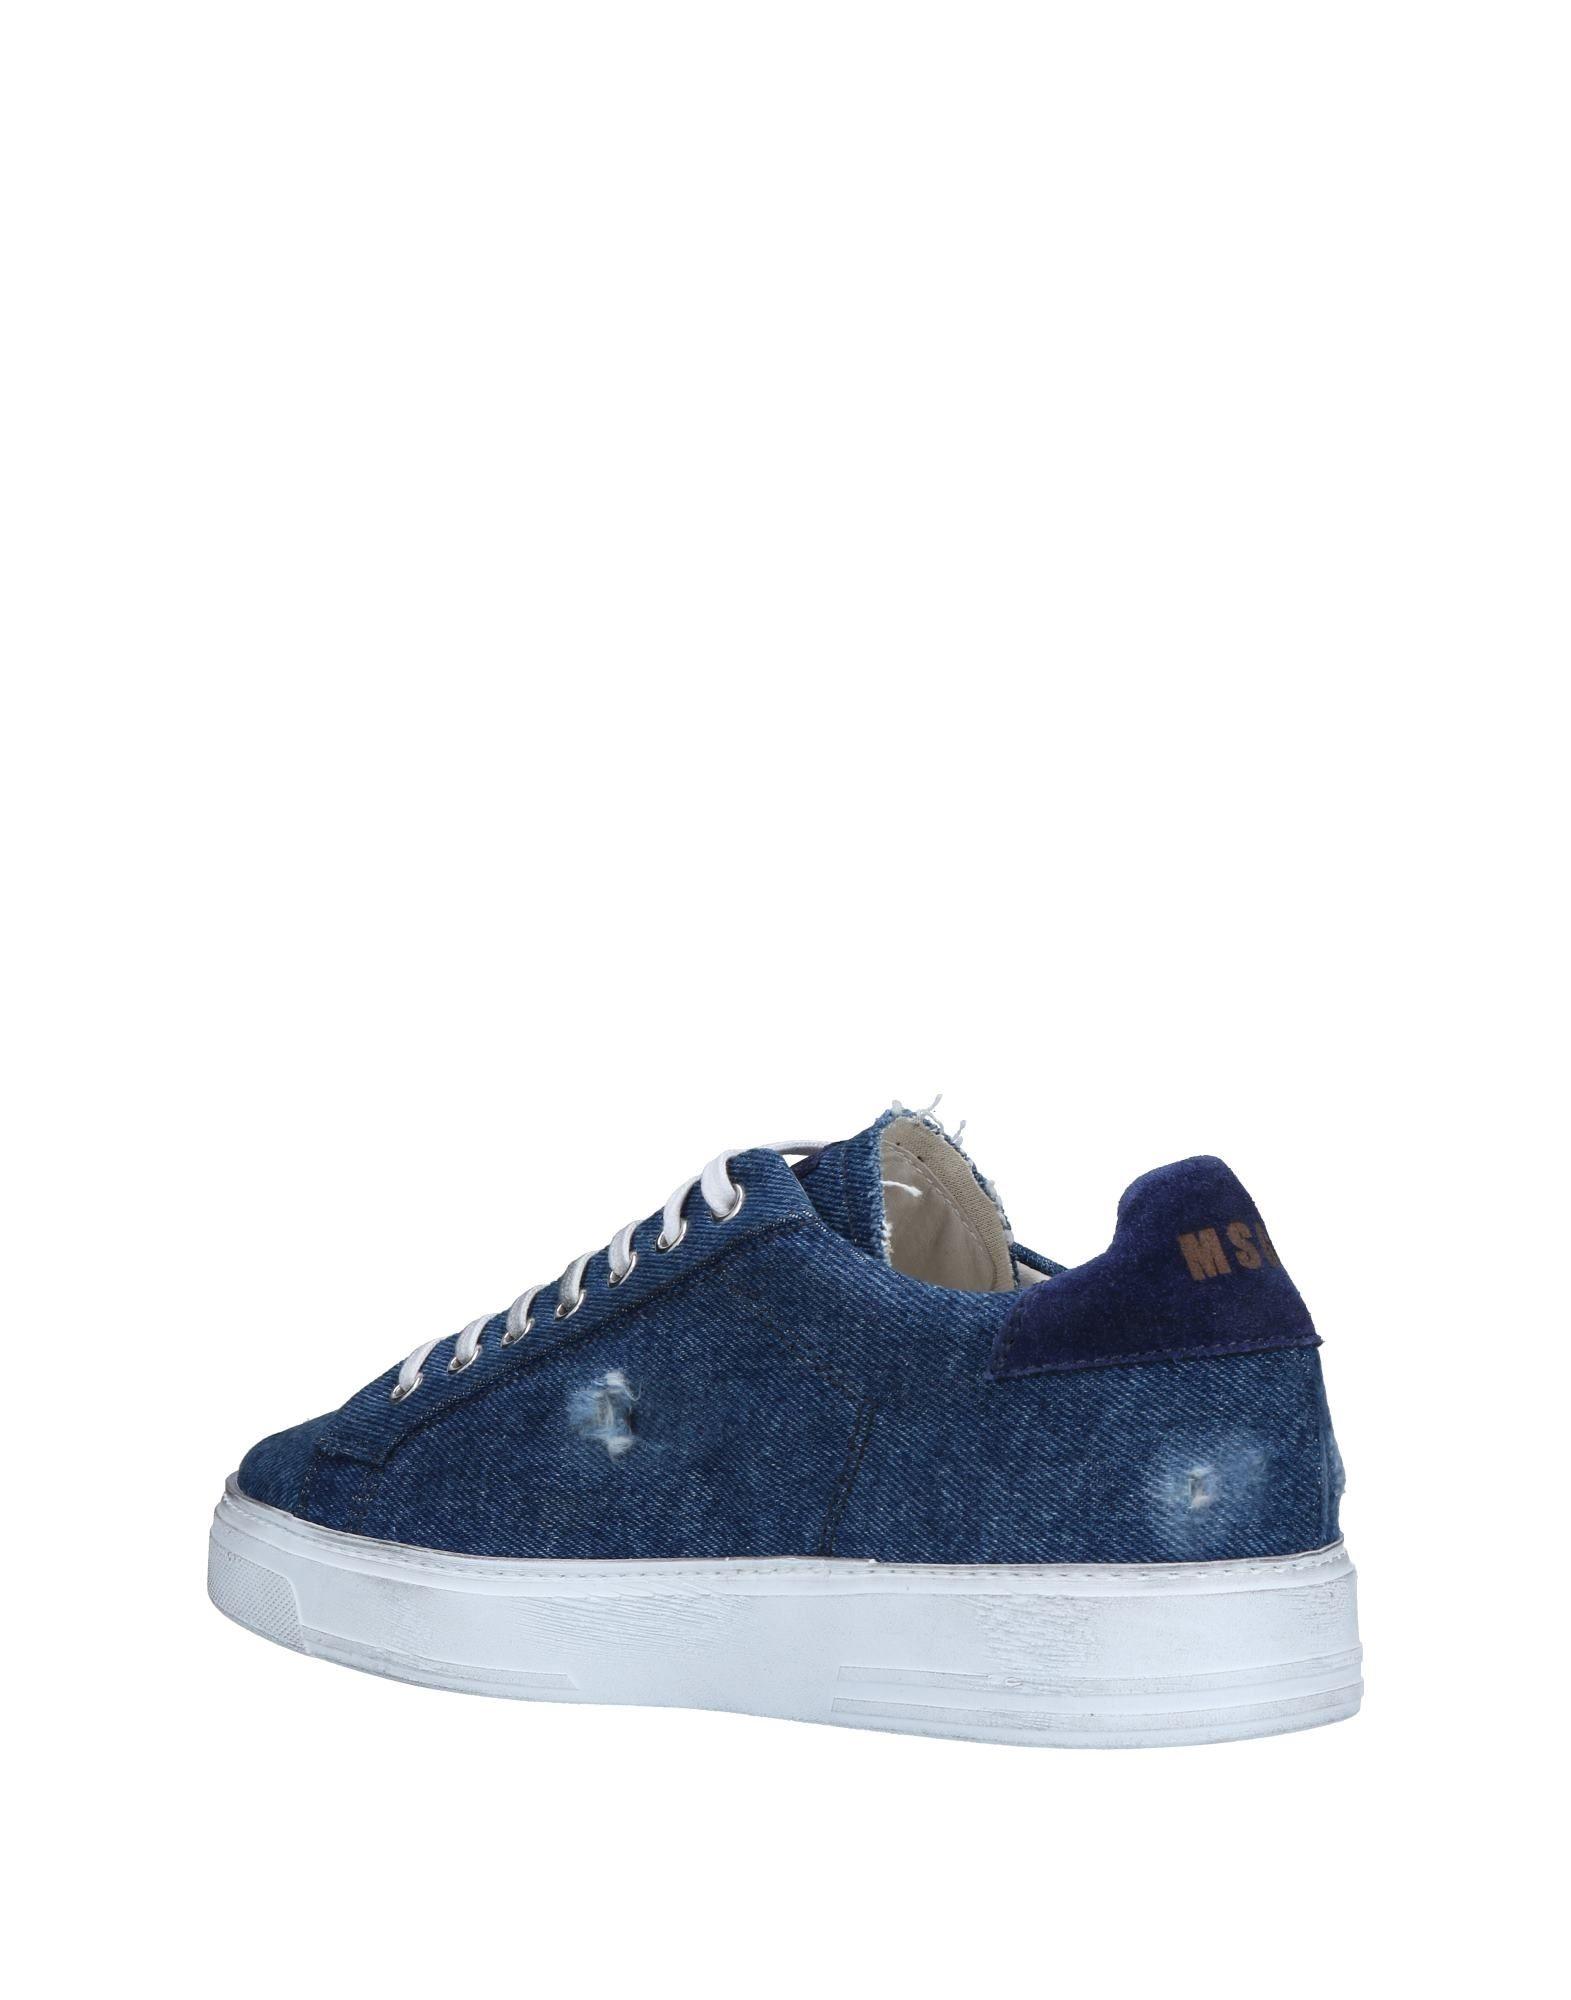 Msgm Sneakers Sneakers Msgm Herren  11500856WR 35f4af